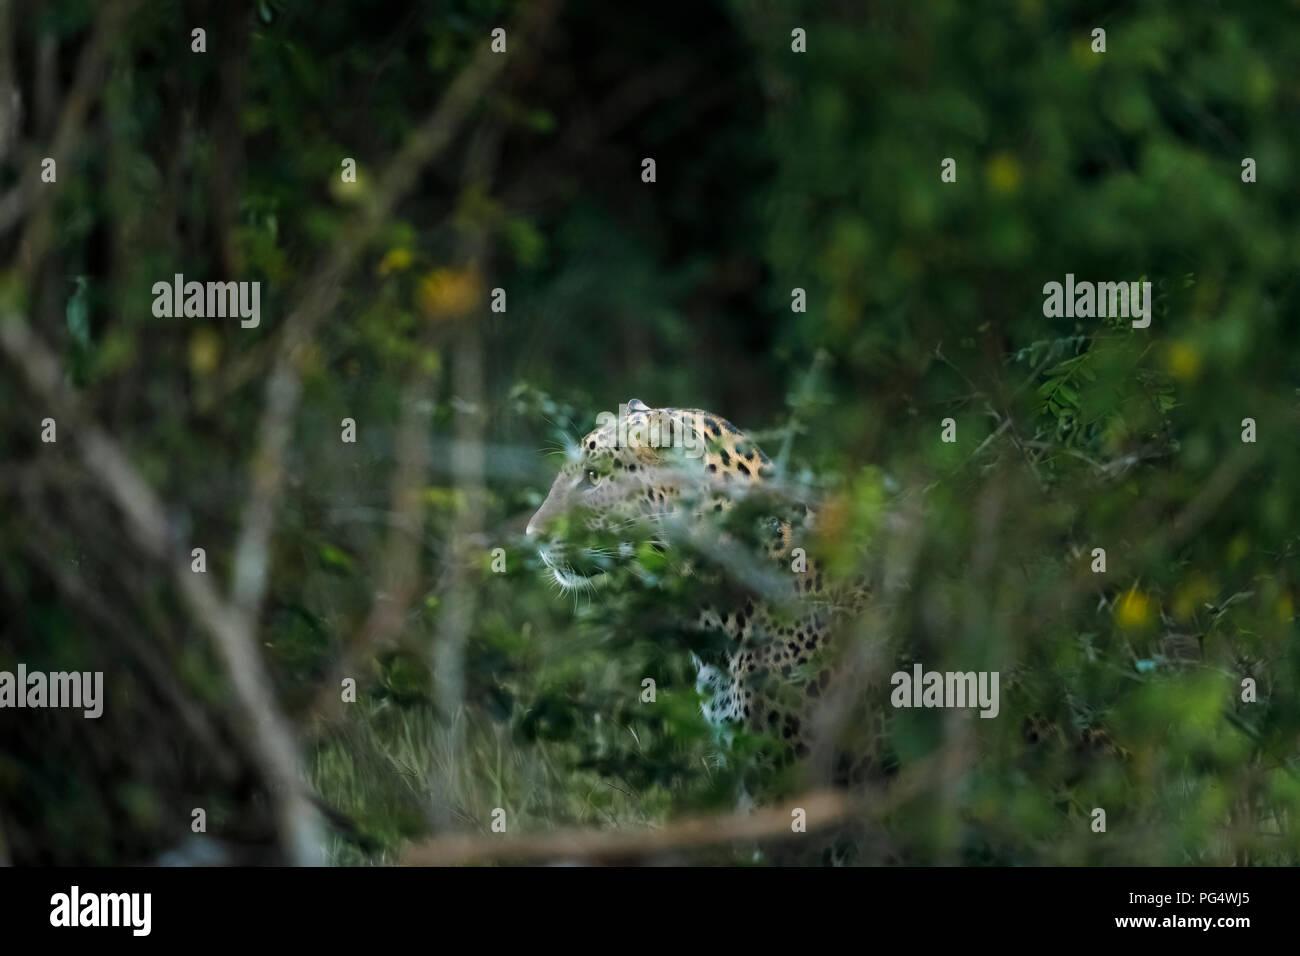 Watchful, alert female leopard (Panthera pardus) hidden in undergrowth stares intently, Kumana National Park, Eastern Province, Sri Lanka - Stock Image